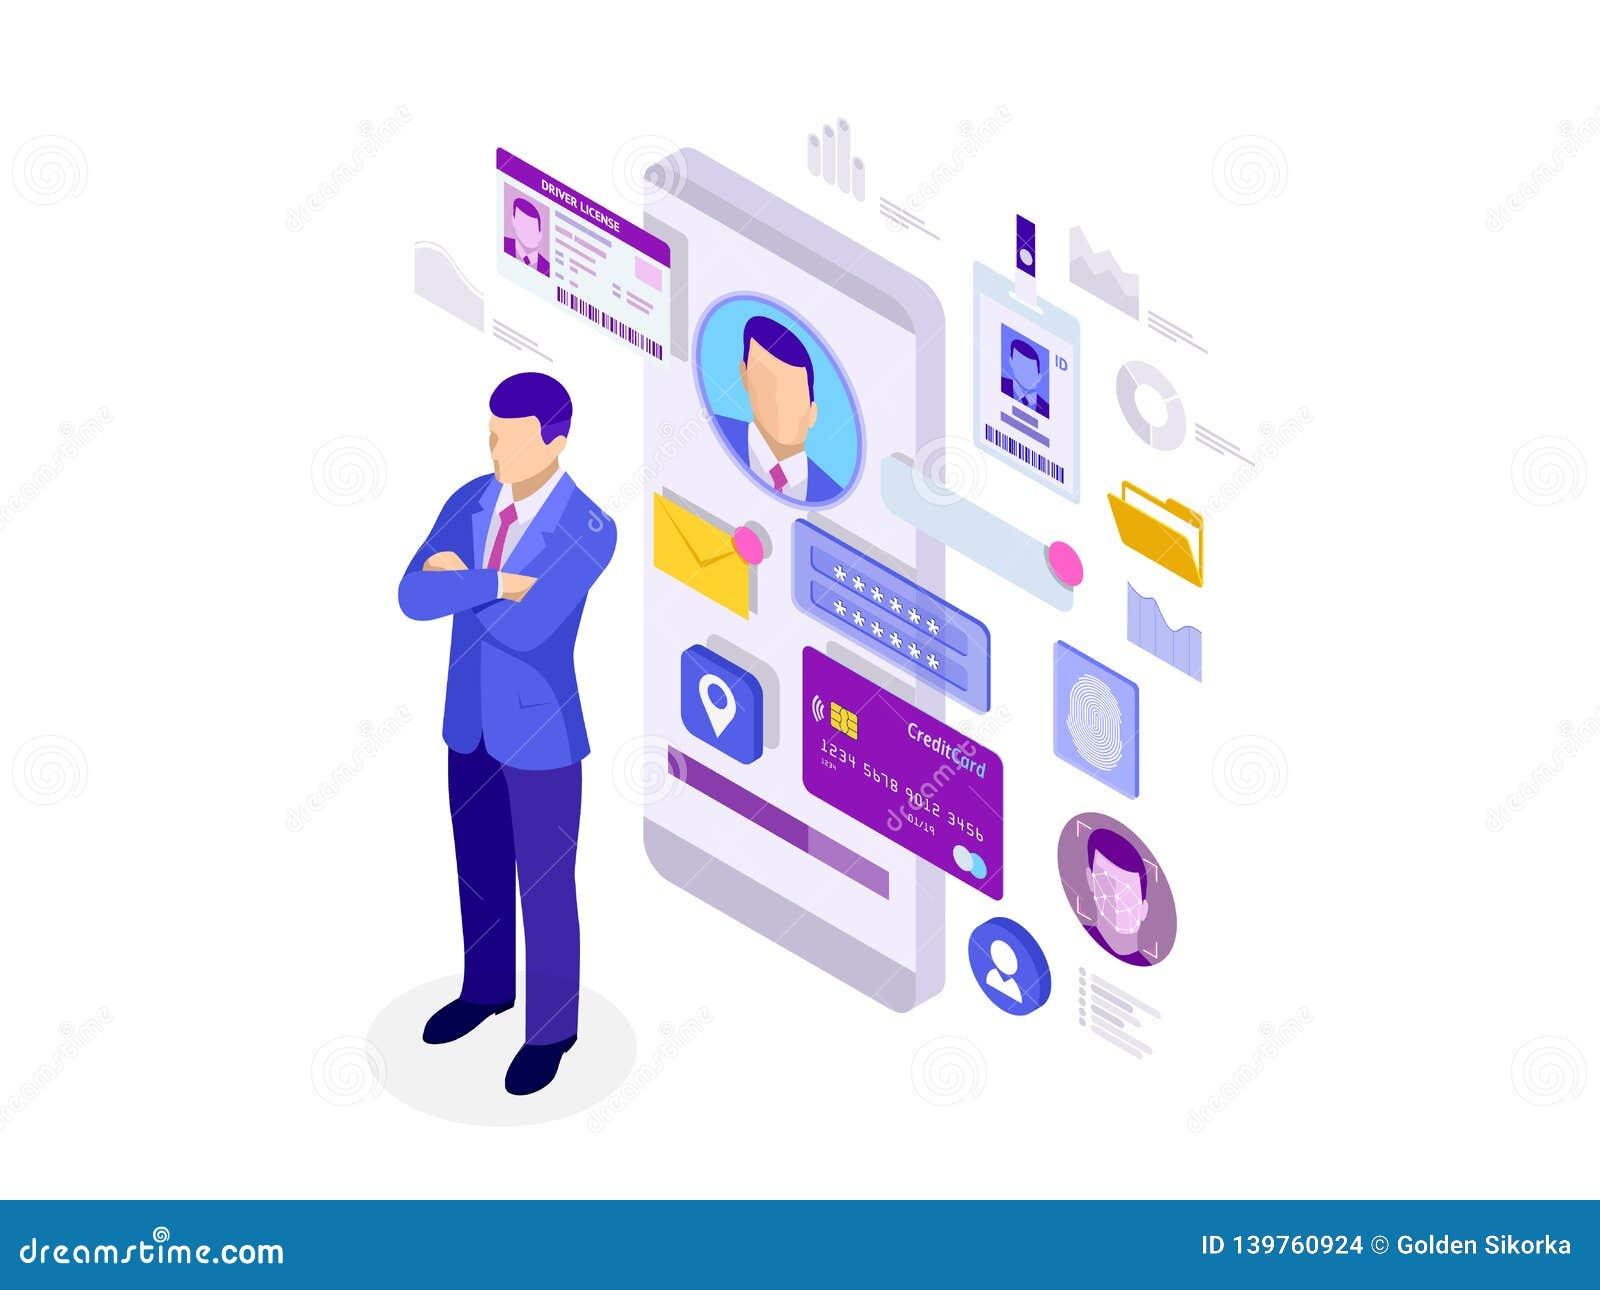 Isometric πληροφορίες App, ιδιωτική έννοια προσωπικών στοιχείων ταυτότητας Τα ψηφιακά στοιχεία εξασφαλίζουν το έμβλημα Τεχνολογία